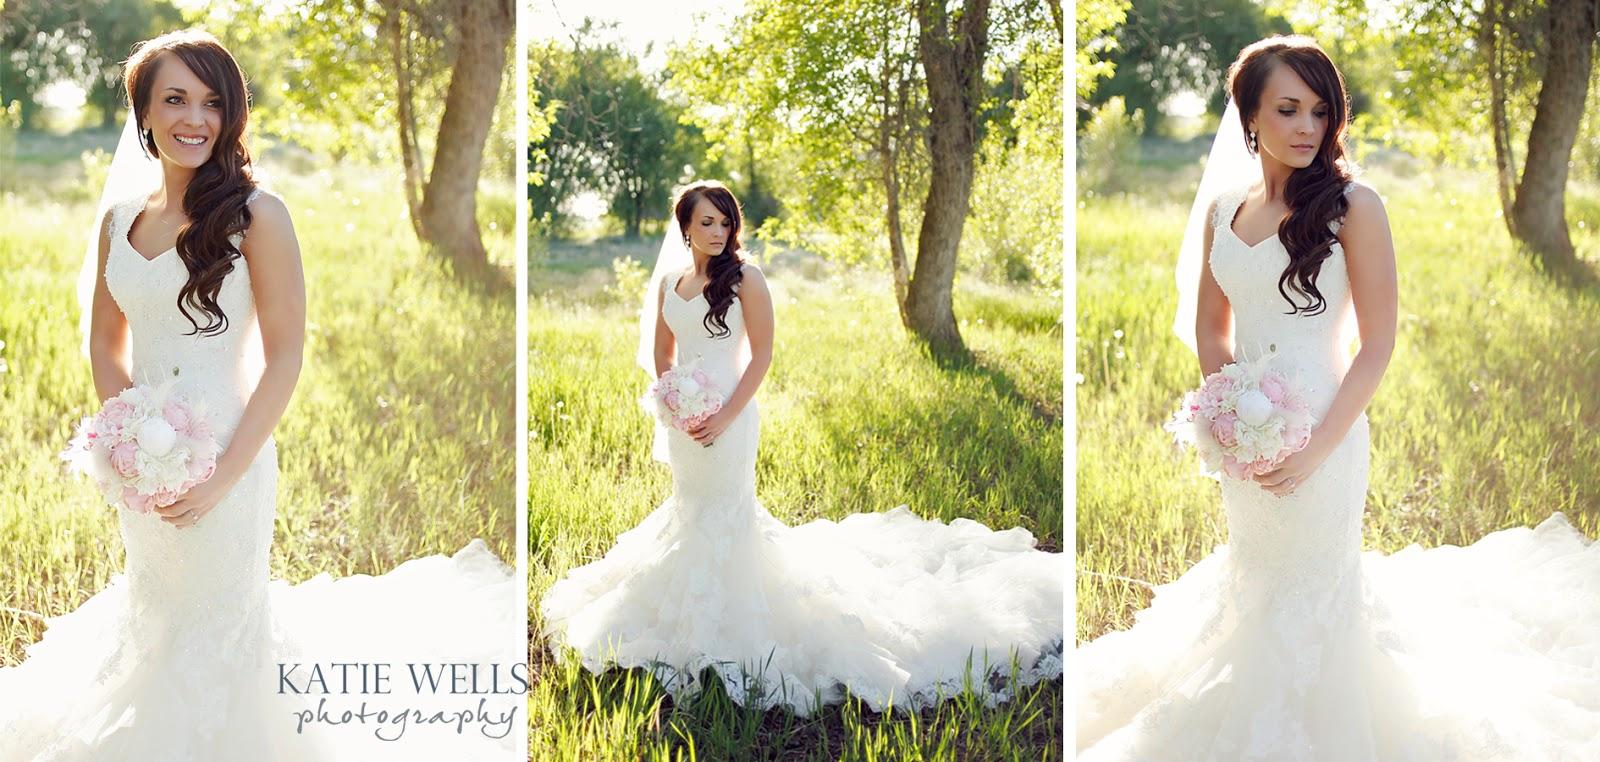 Katie Wells Photography Idaho Falls Wedding Photographer Mckijah Whitney